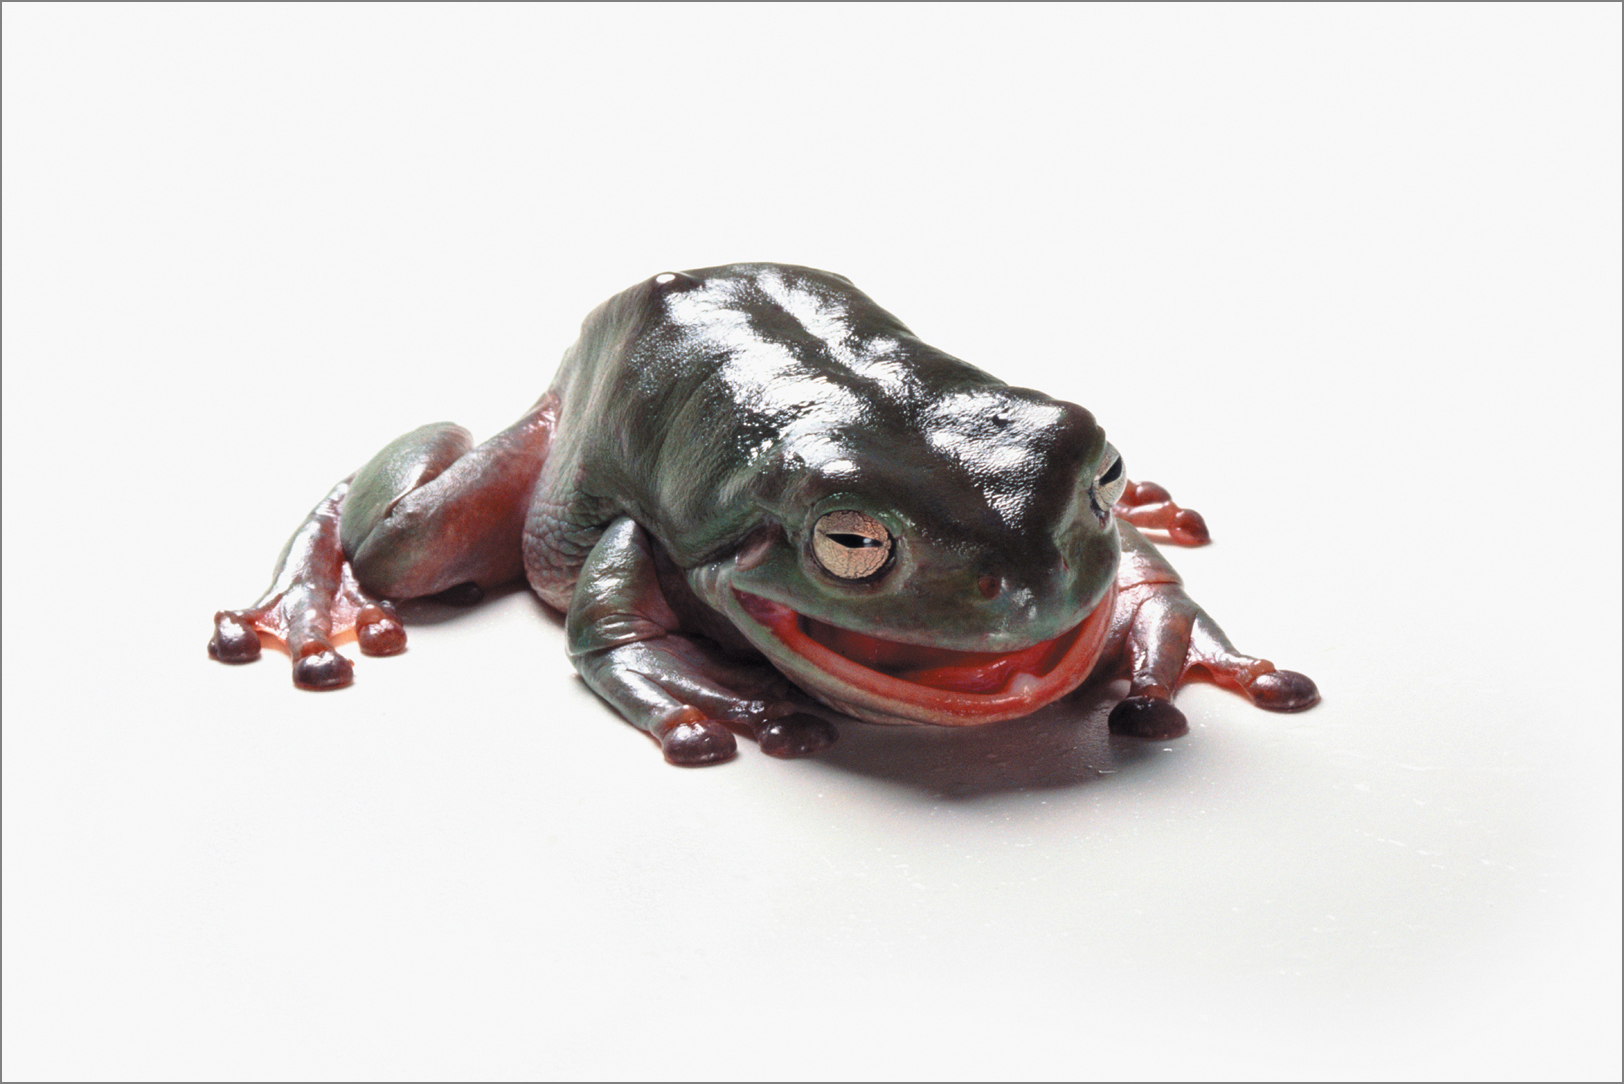 fc_frog9_4g.jpg